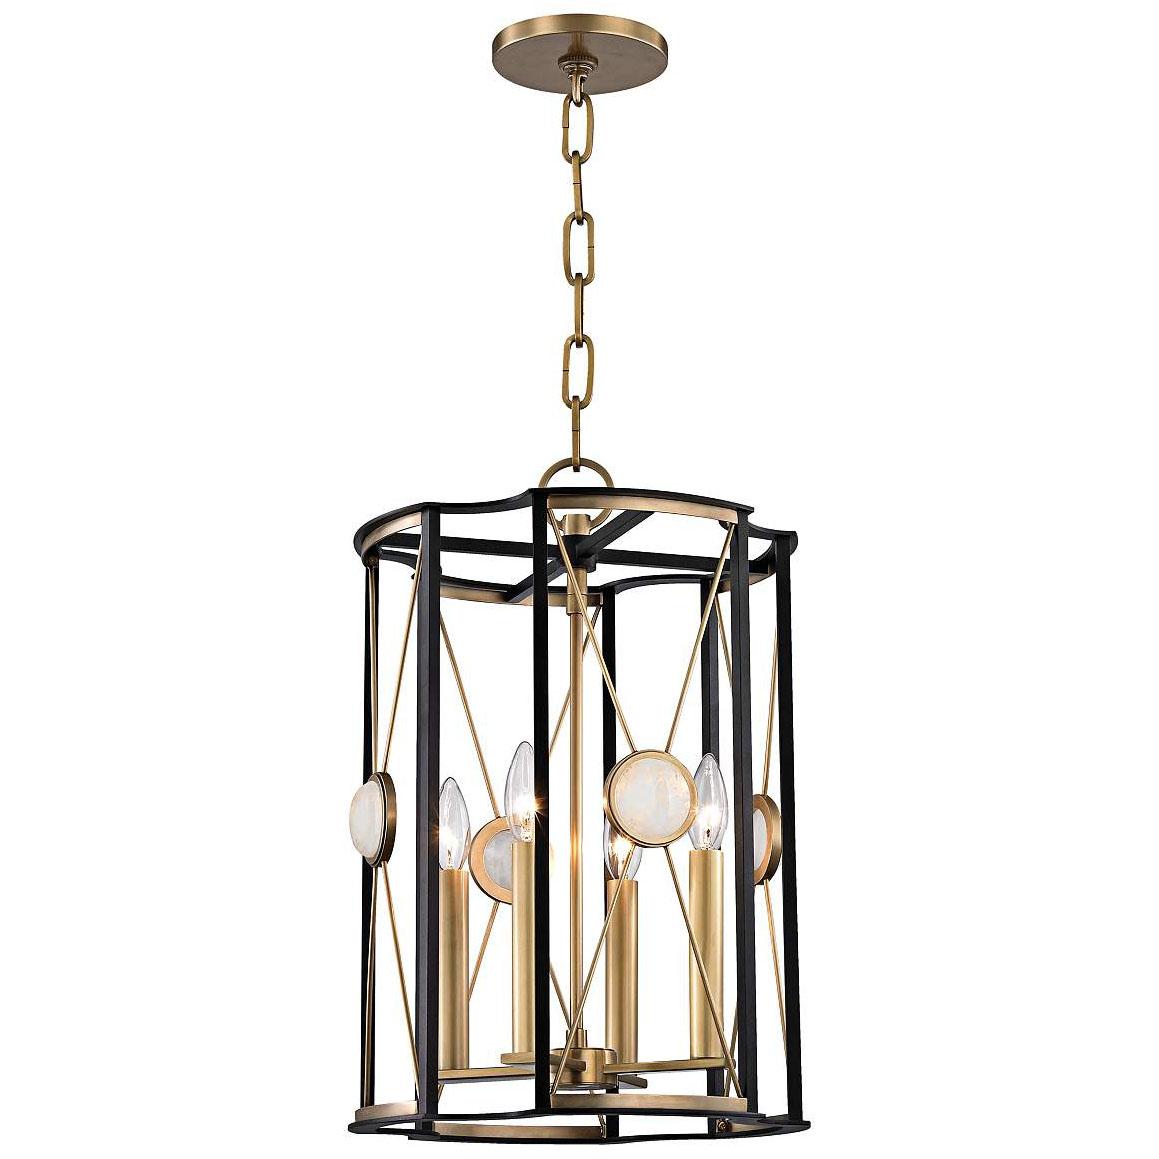 Aged Brass And Quartz Pendant Light